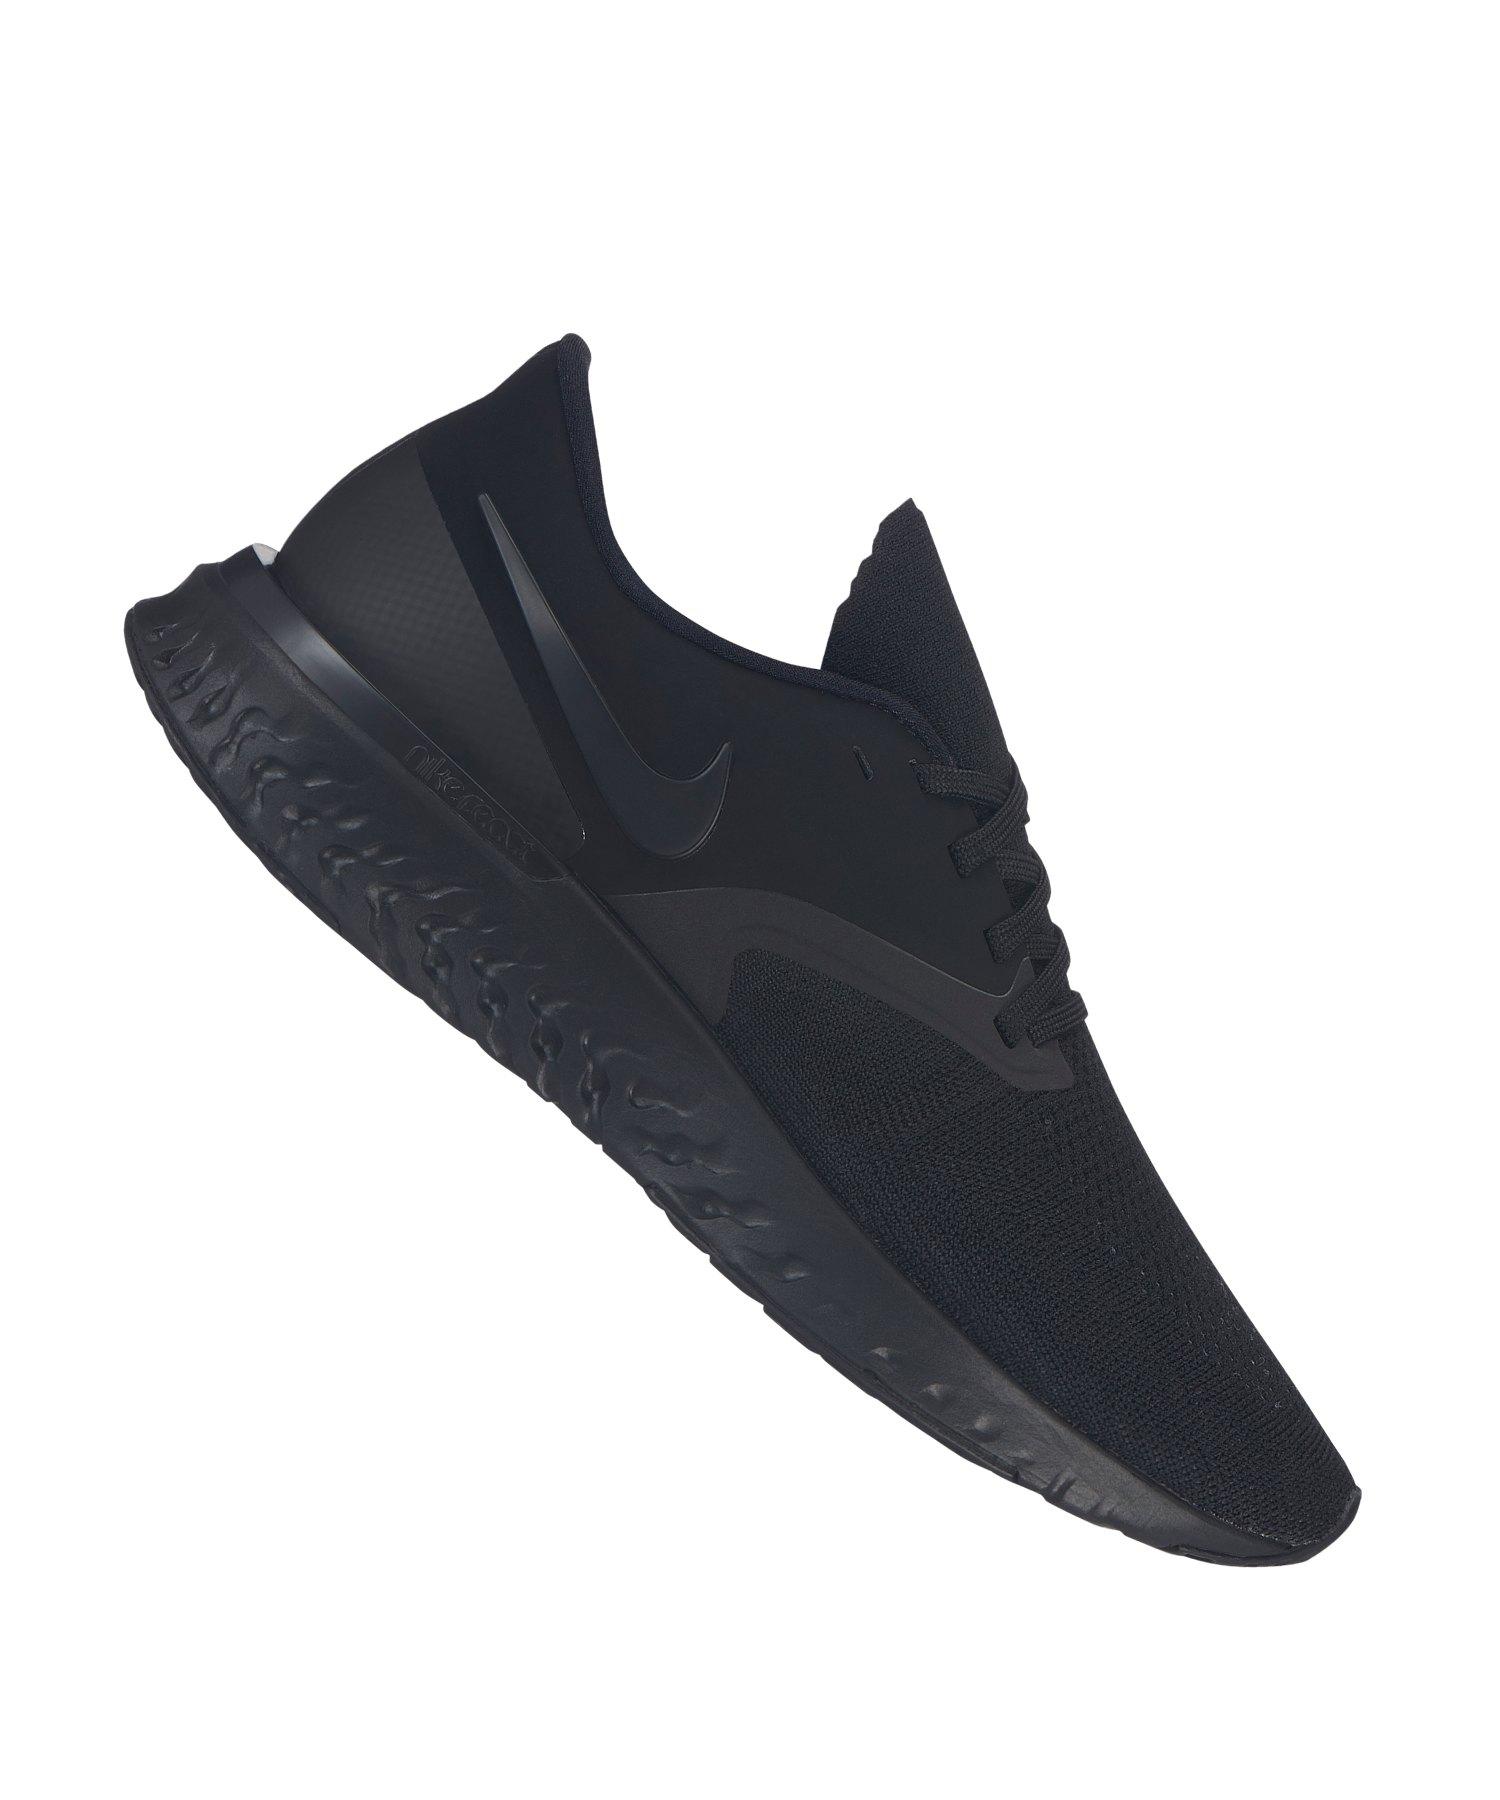 Nike Odyssey React Flyknit 2 Running Schwarz F003 - schwarz